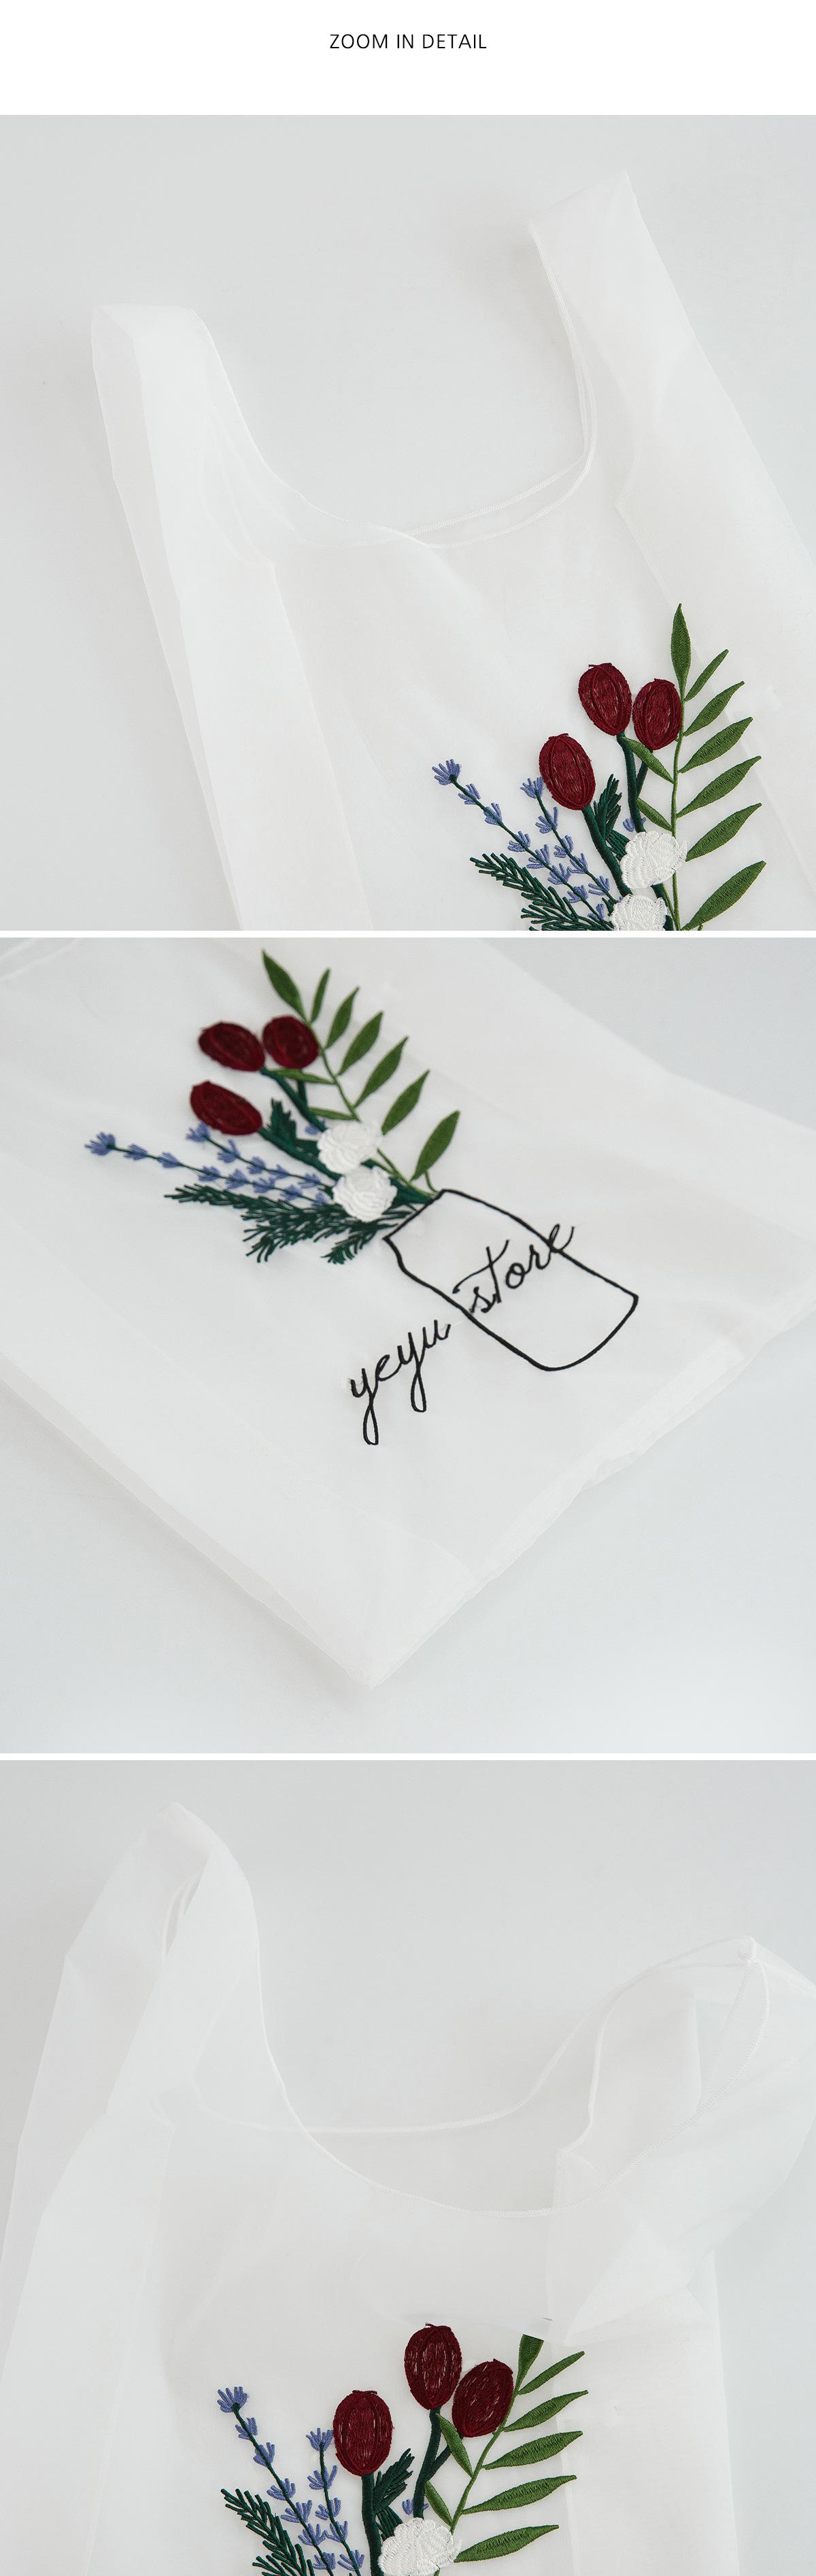 sheer embroidery bag